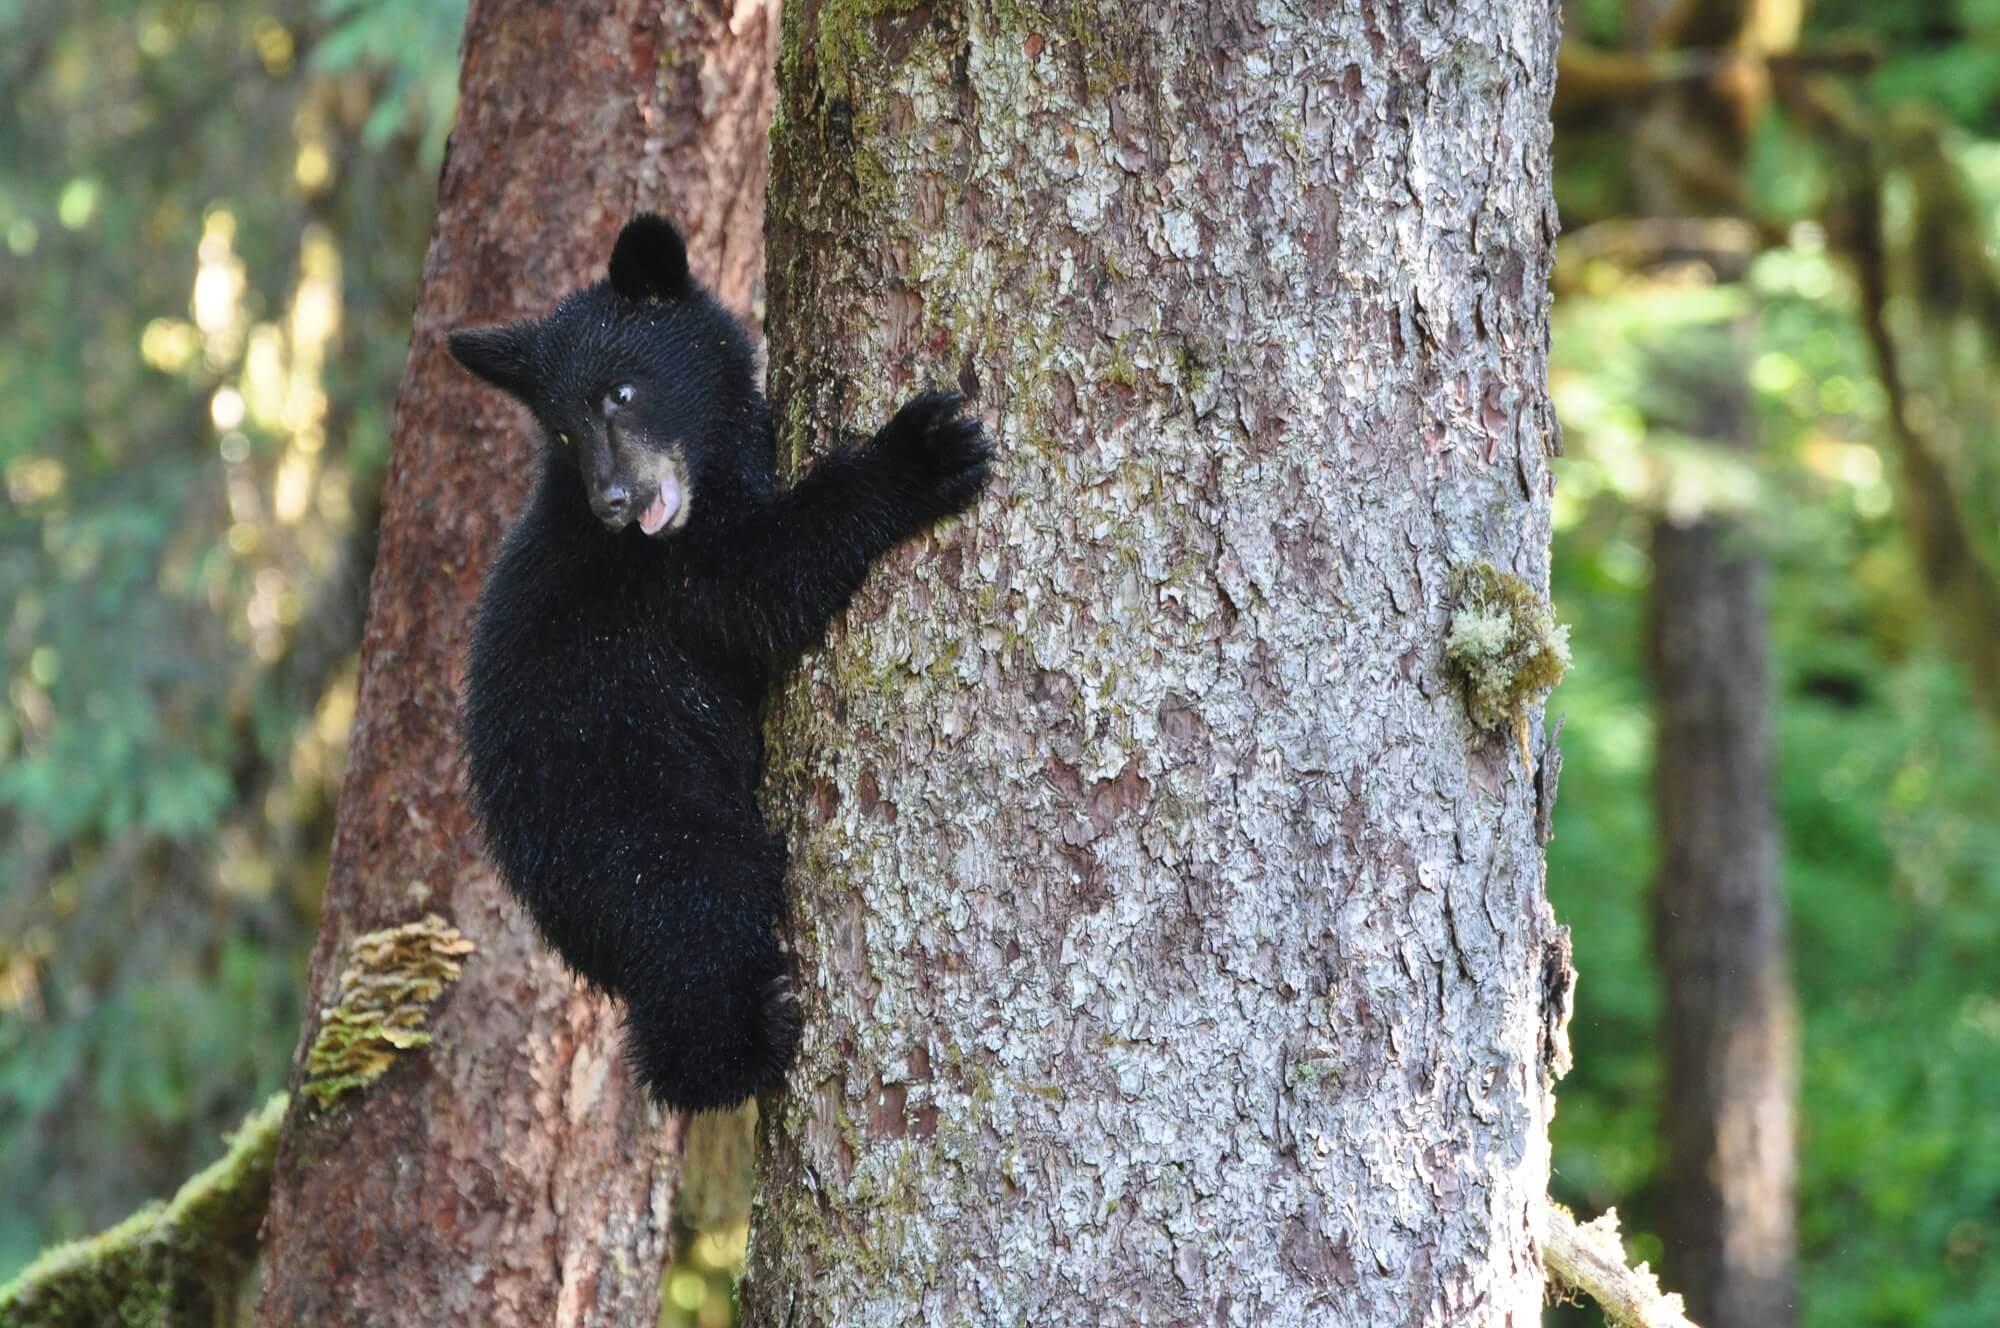 https://secureservercdn.net/72.167.241.180/c2p.415.myftpupload.com/wp-content/uploads/2018/10/Alaska-Bear-cub-in-tree.jpg?time=1634200883